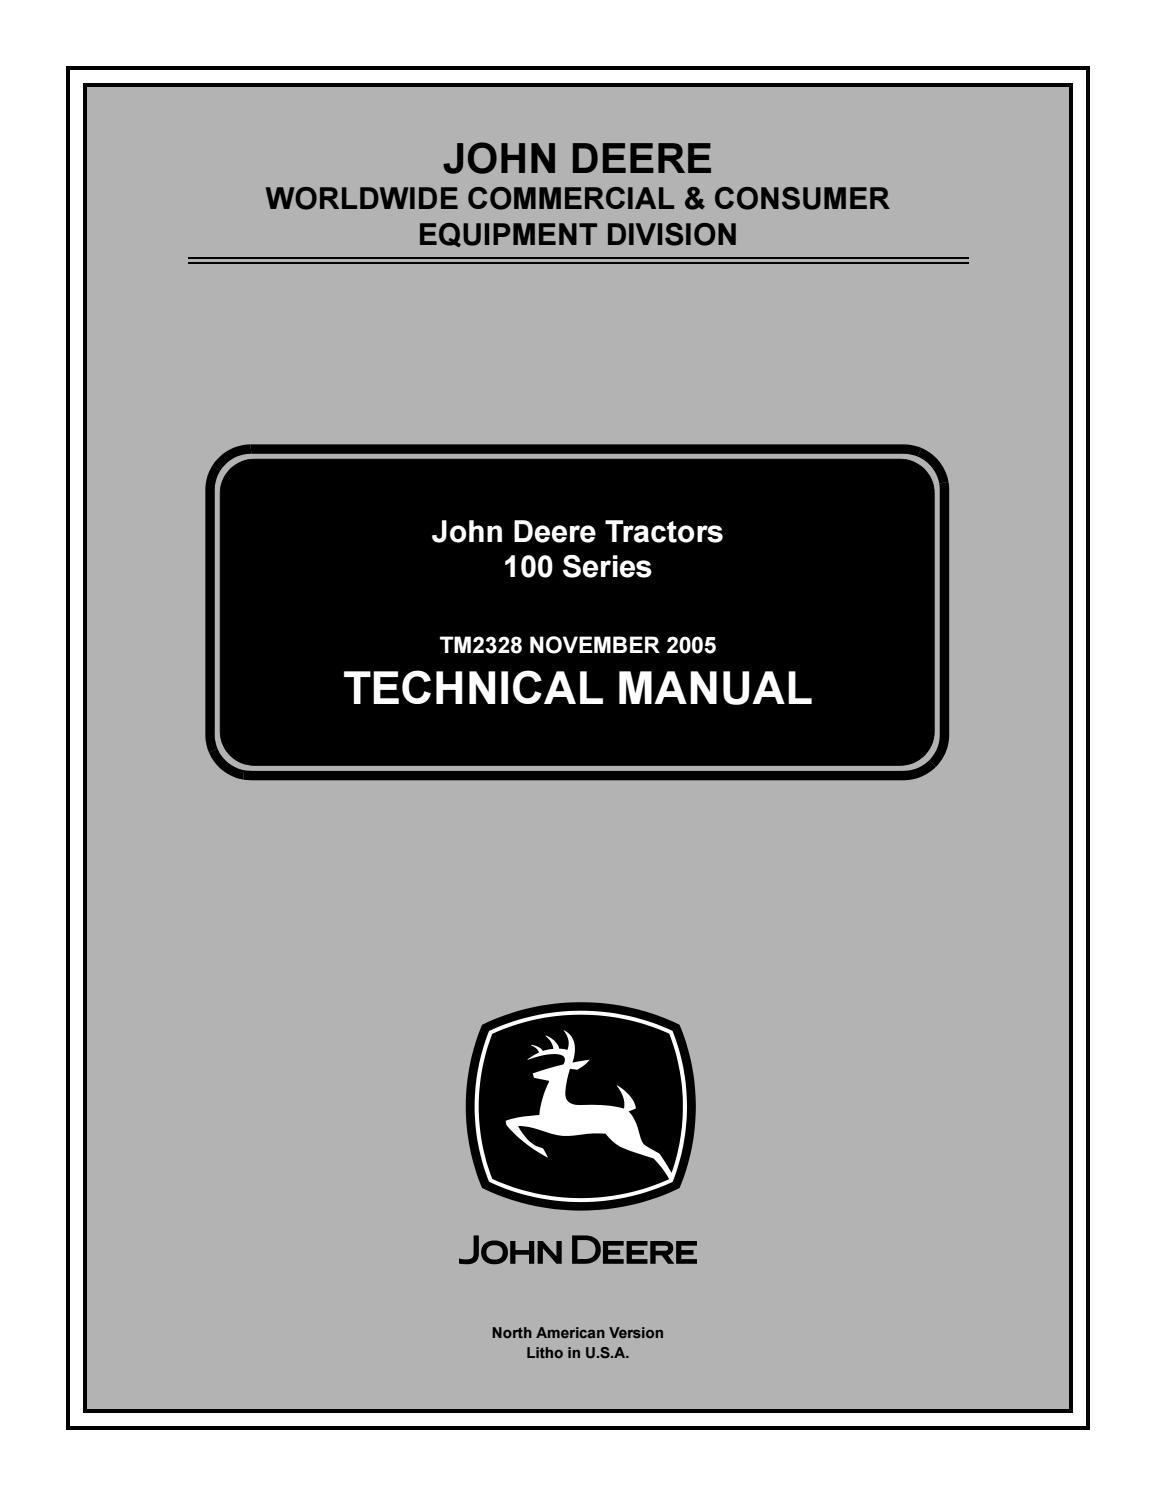 JOHN DEERE 155C LAWN GARDEN TRACTOR Service Repair Manual by 163114103 -  issuuIssuu